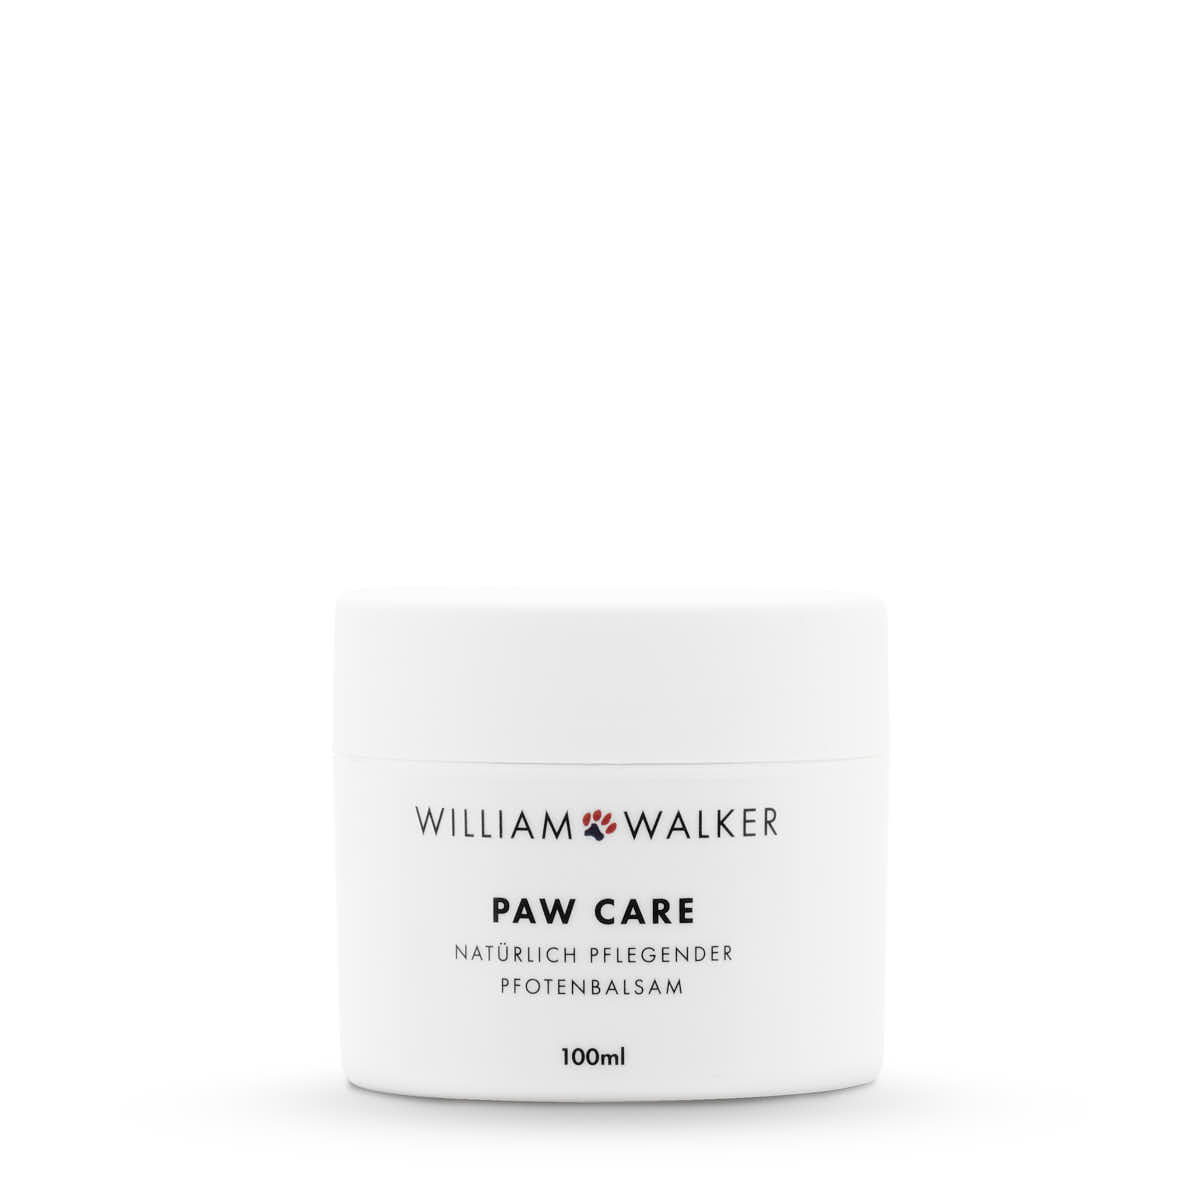 Hundepfotenbalsam Paw Care William Walker